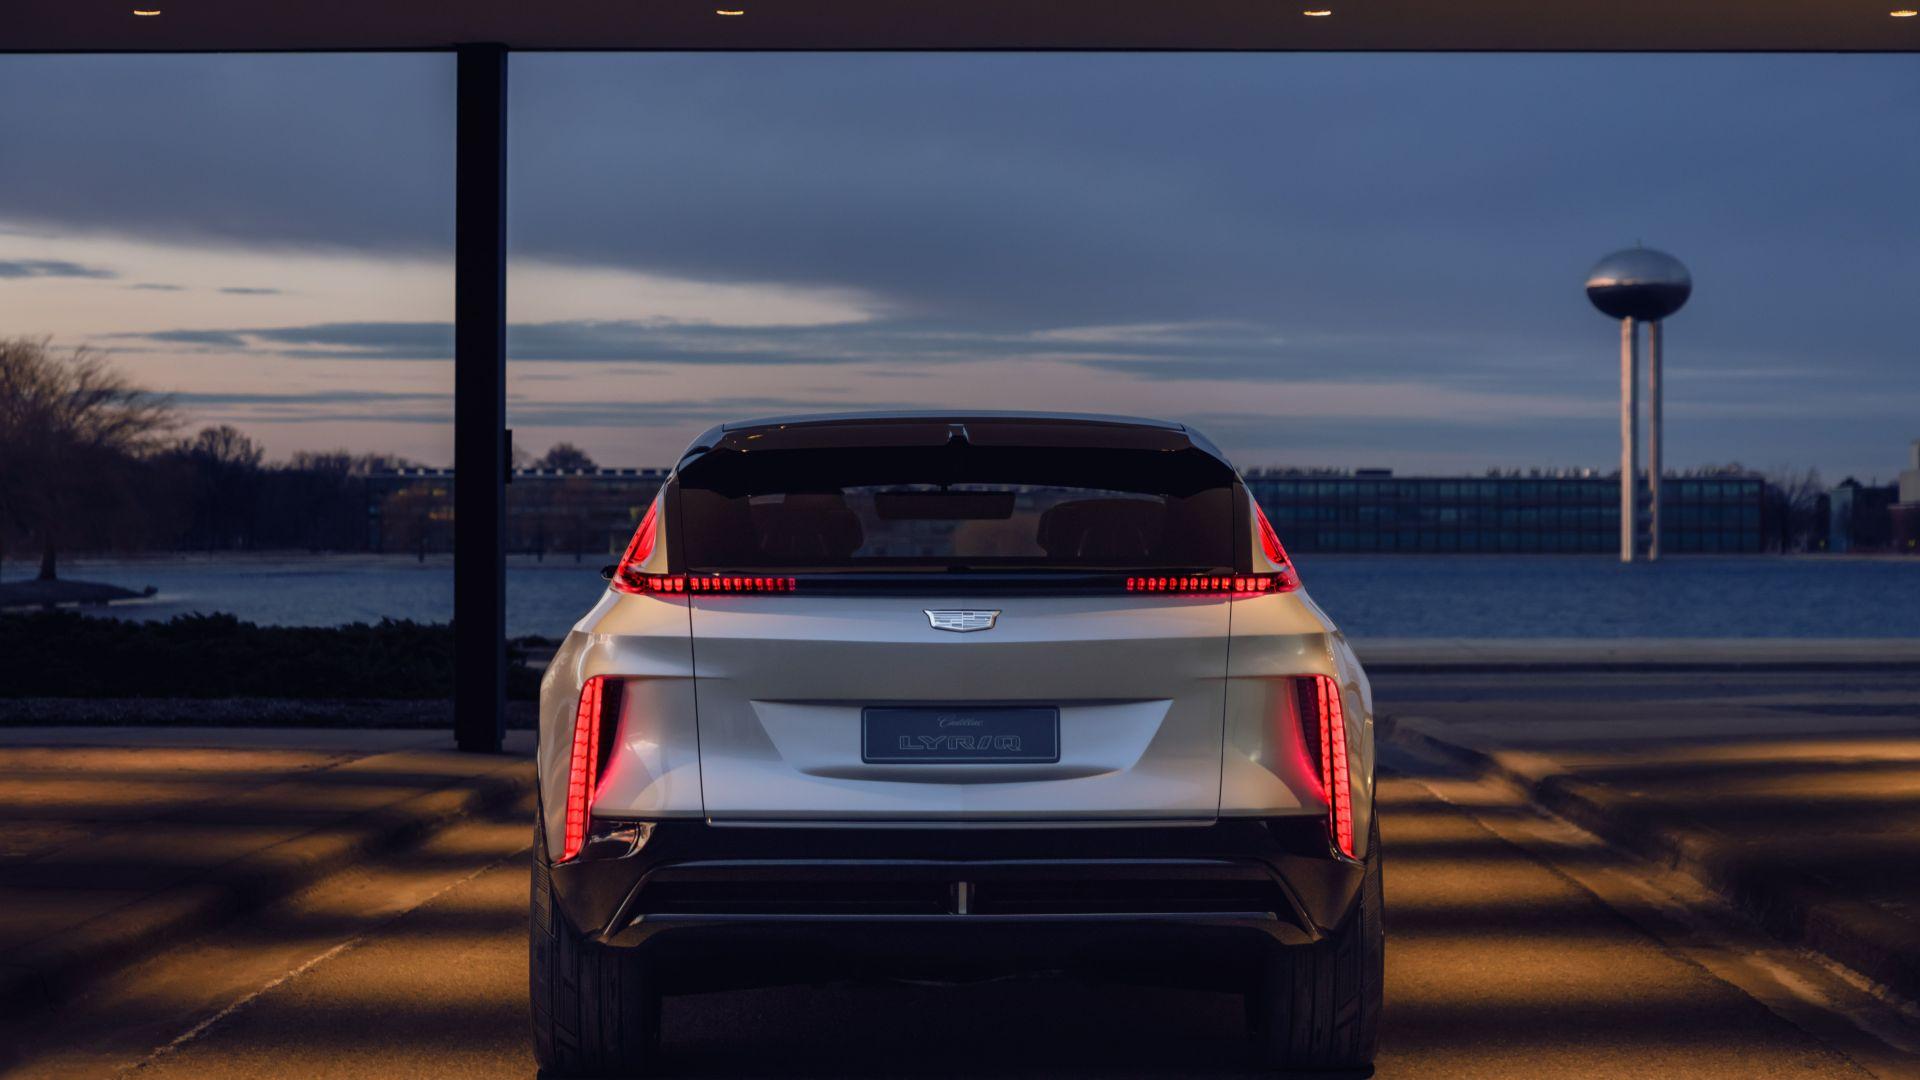 Wallpaper Cadillac Lyriq, SUV, 2021 cars, electric cars ...